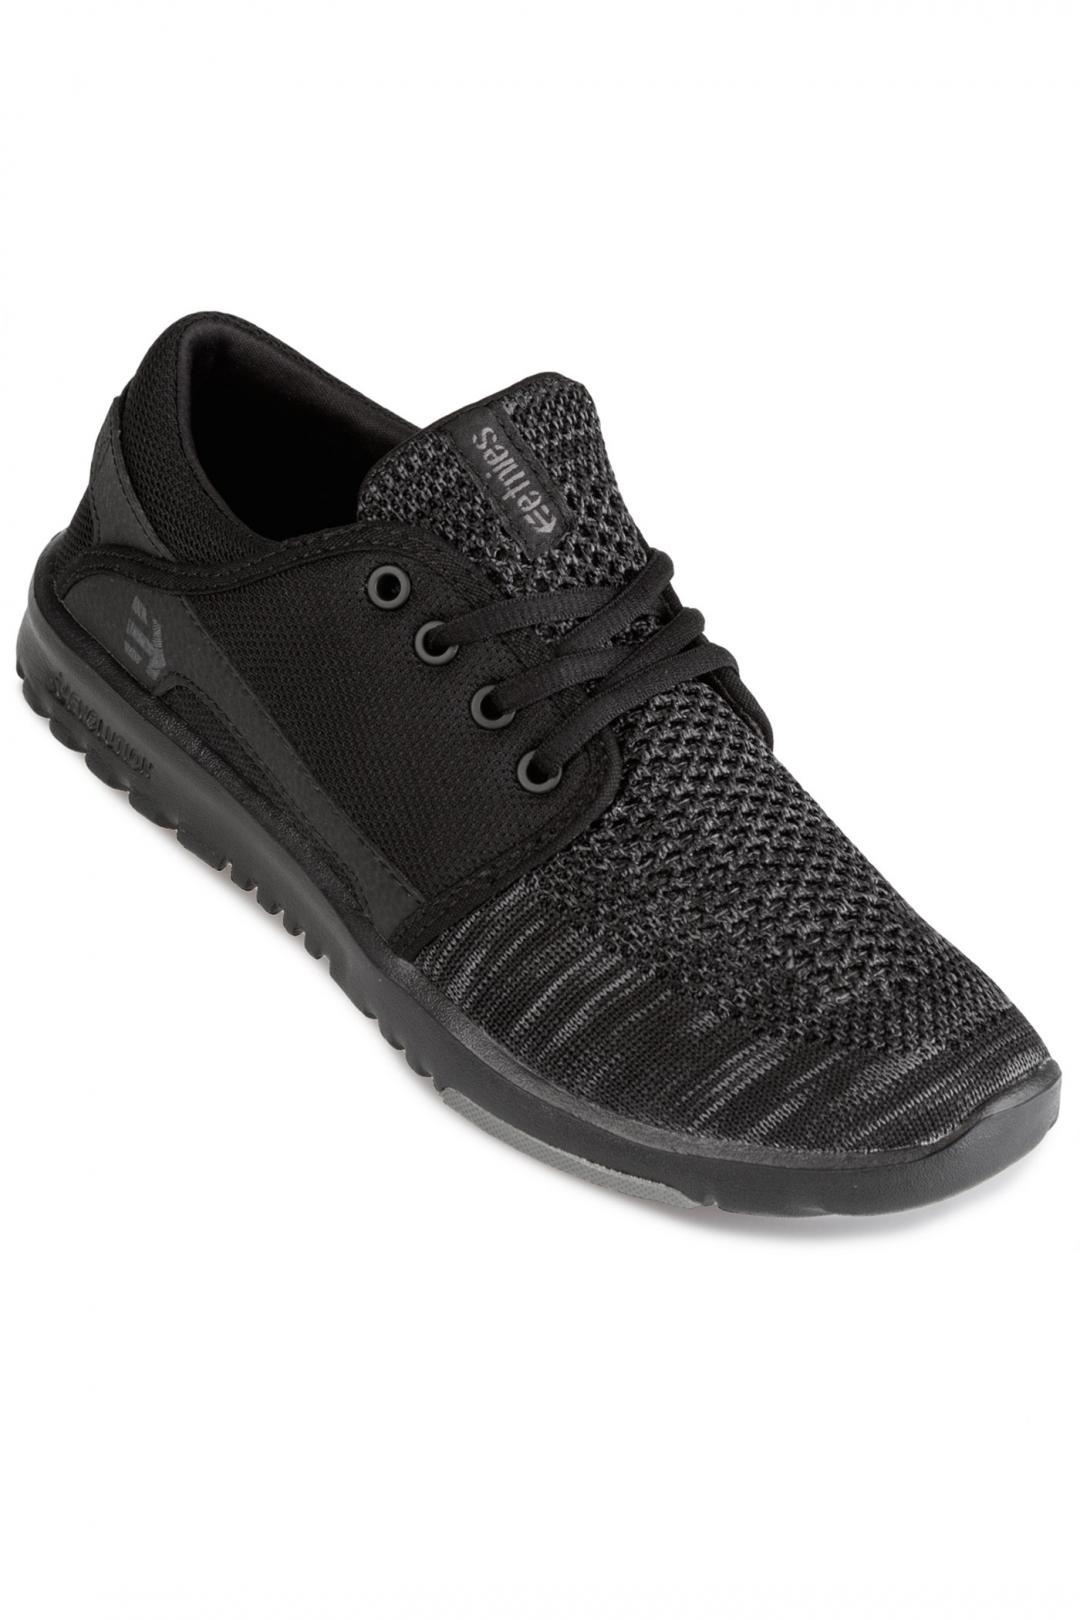 Donna Etnies Scout YB black grey black   Sneakers low top